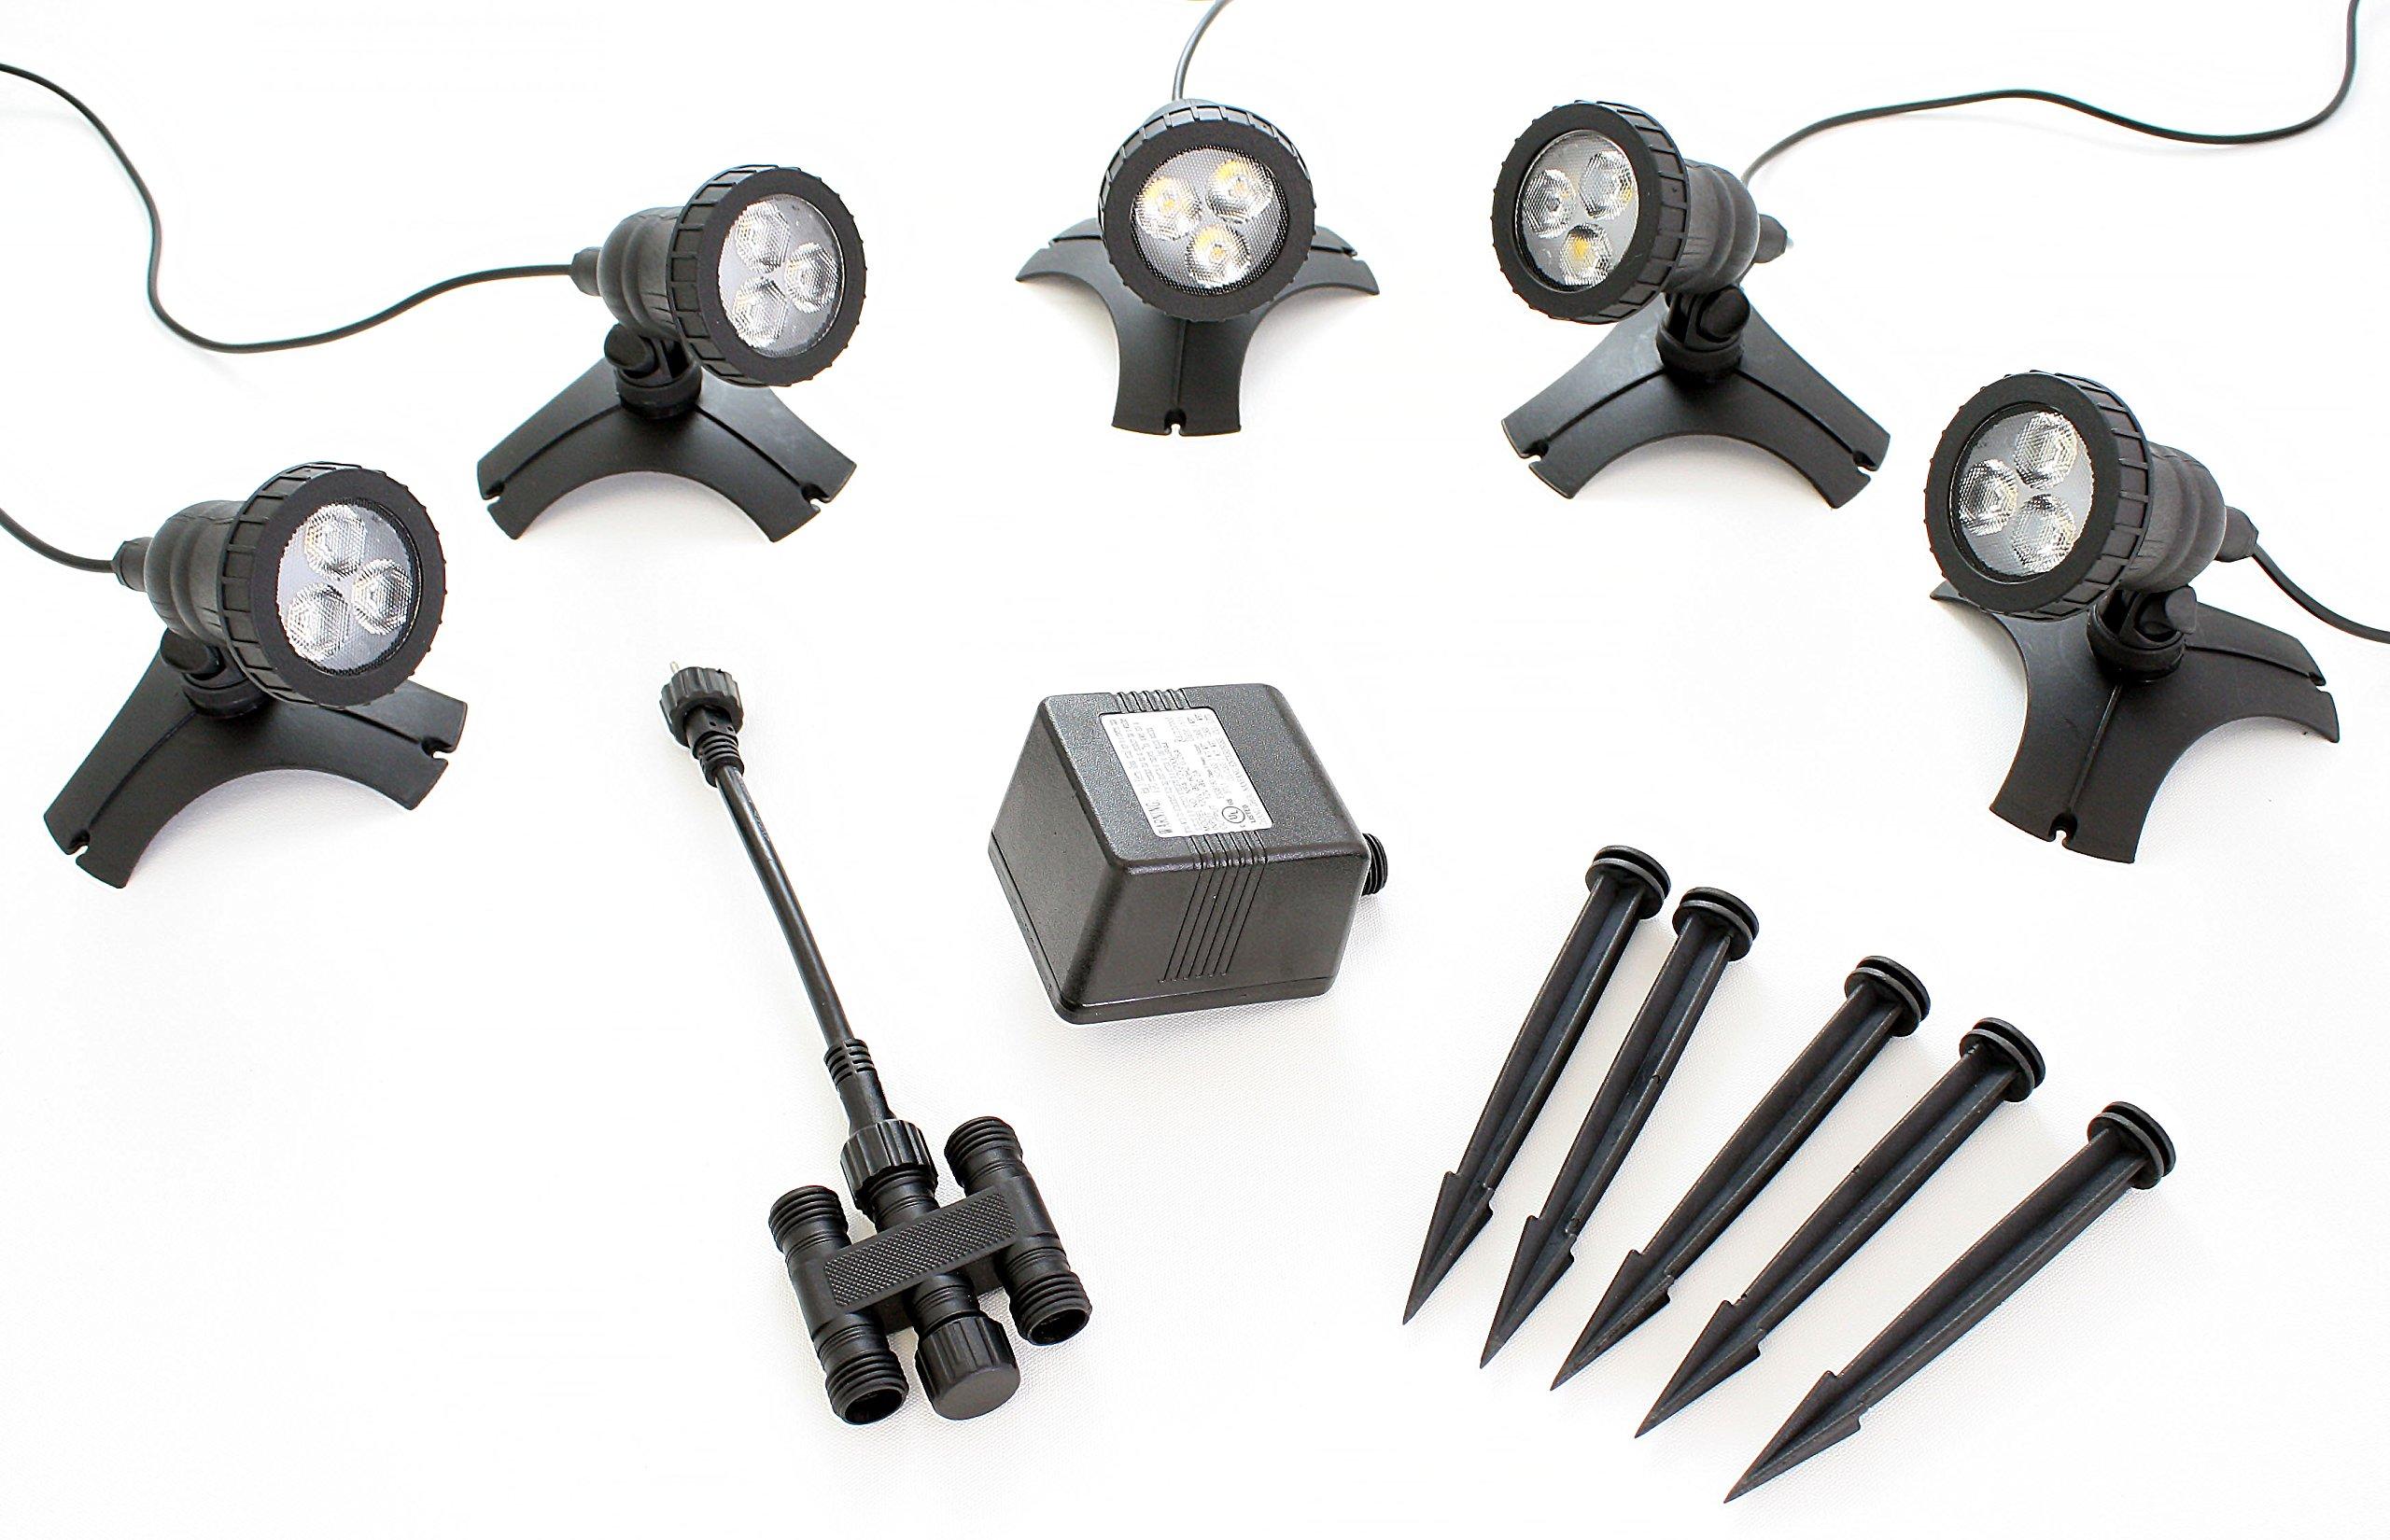 Pond Force LED Pond Light Kit (5 Light Kit) by Pond Force